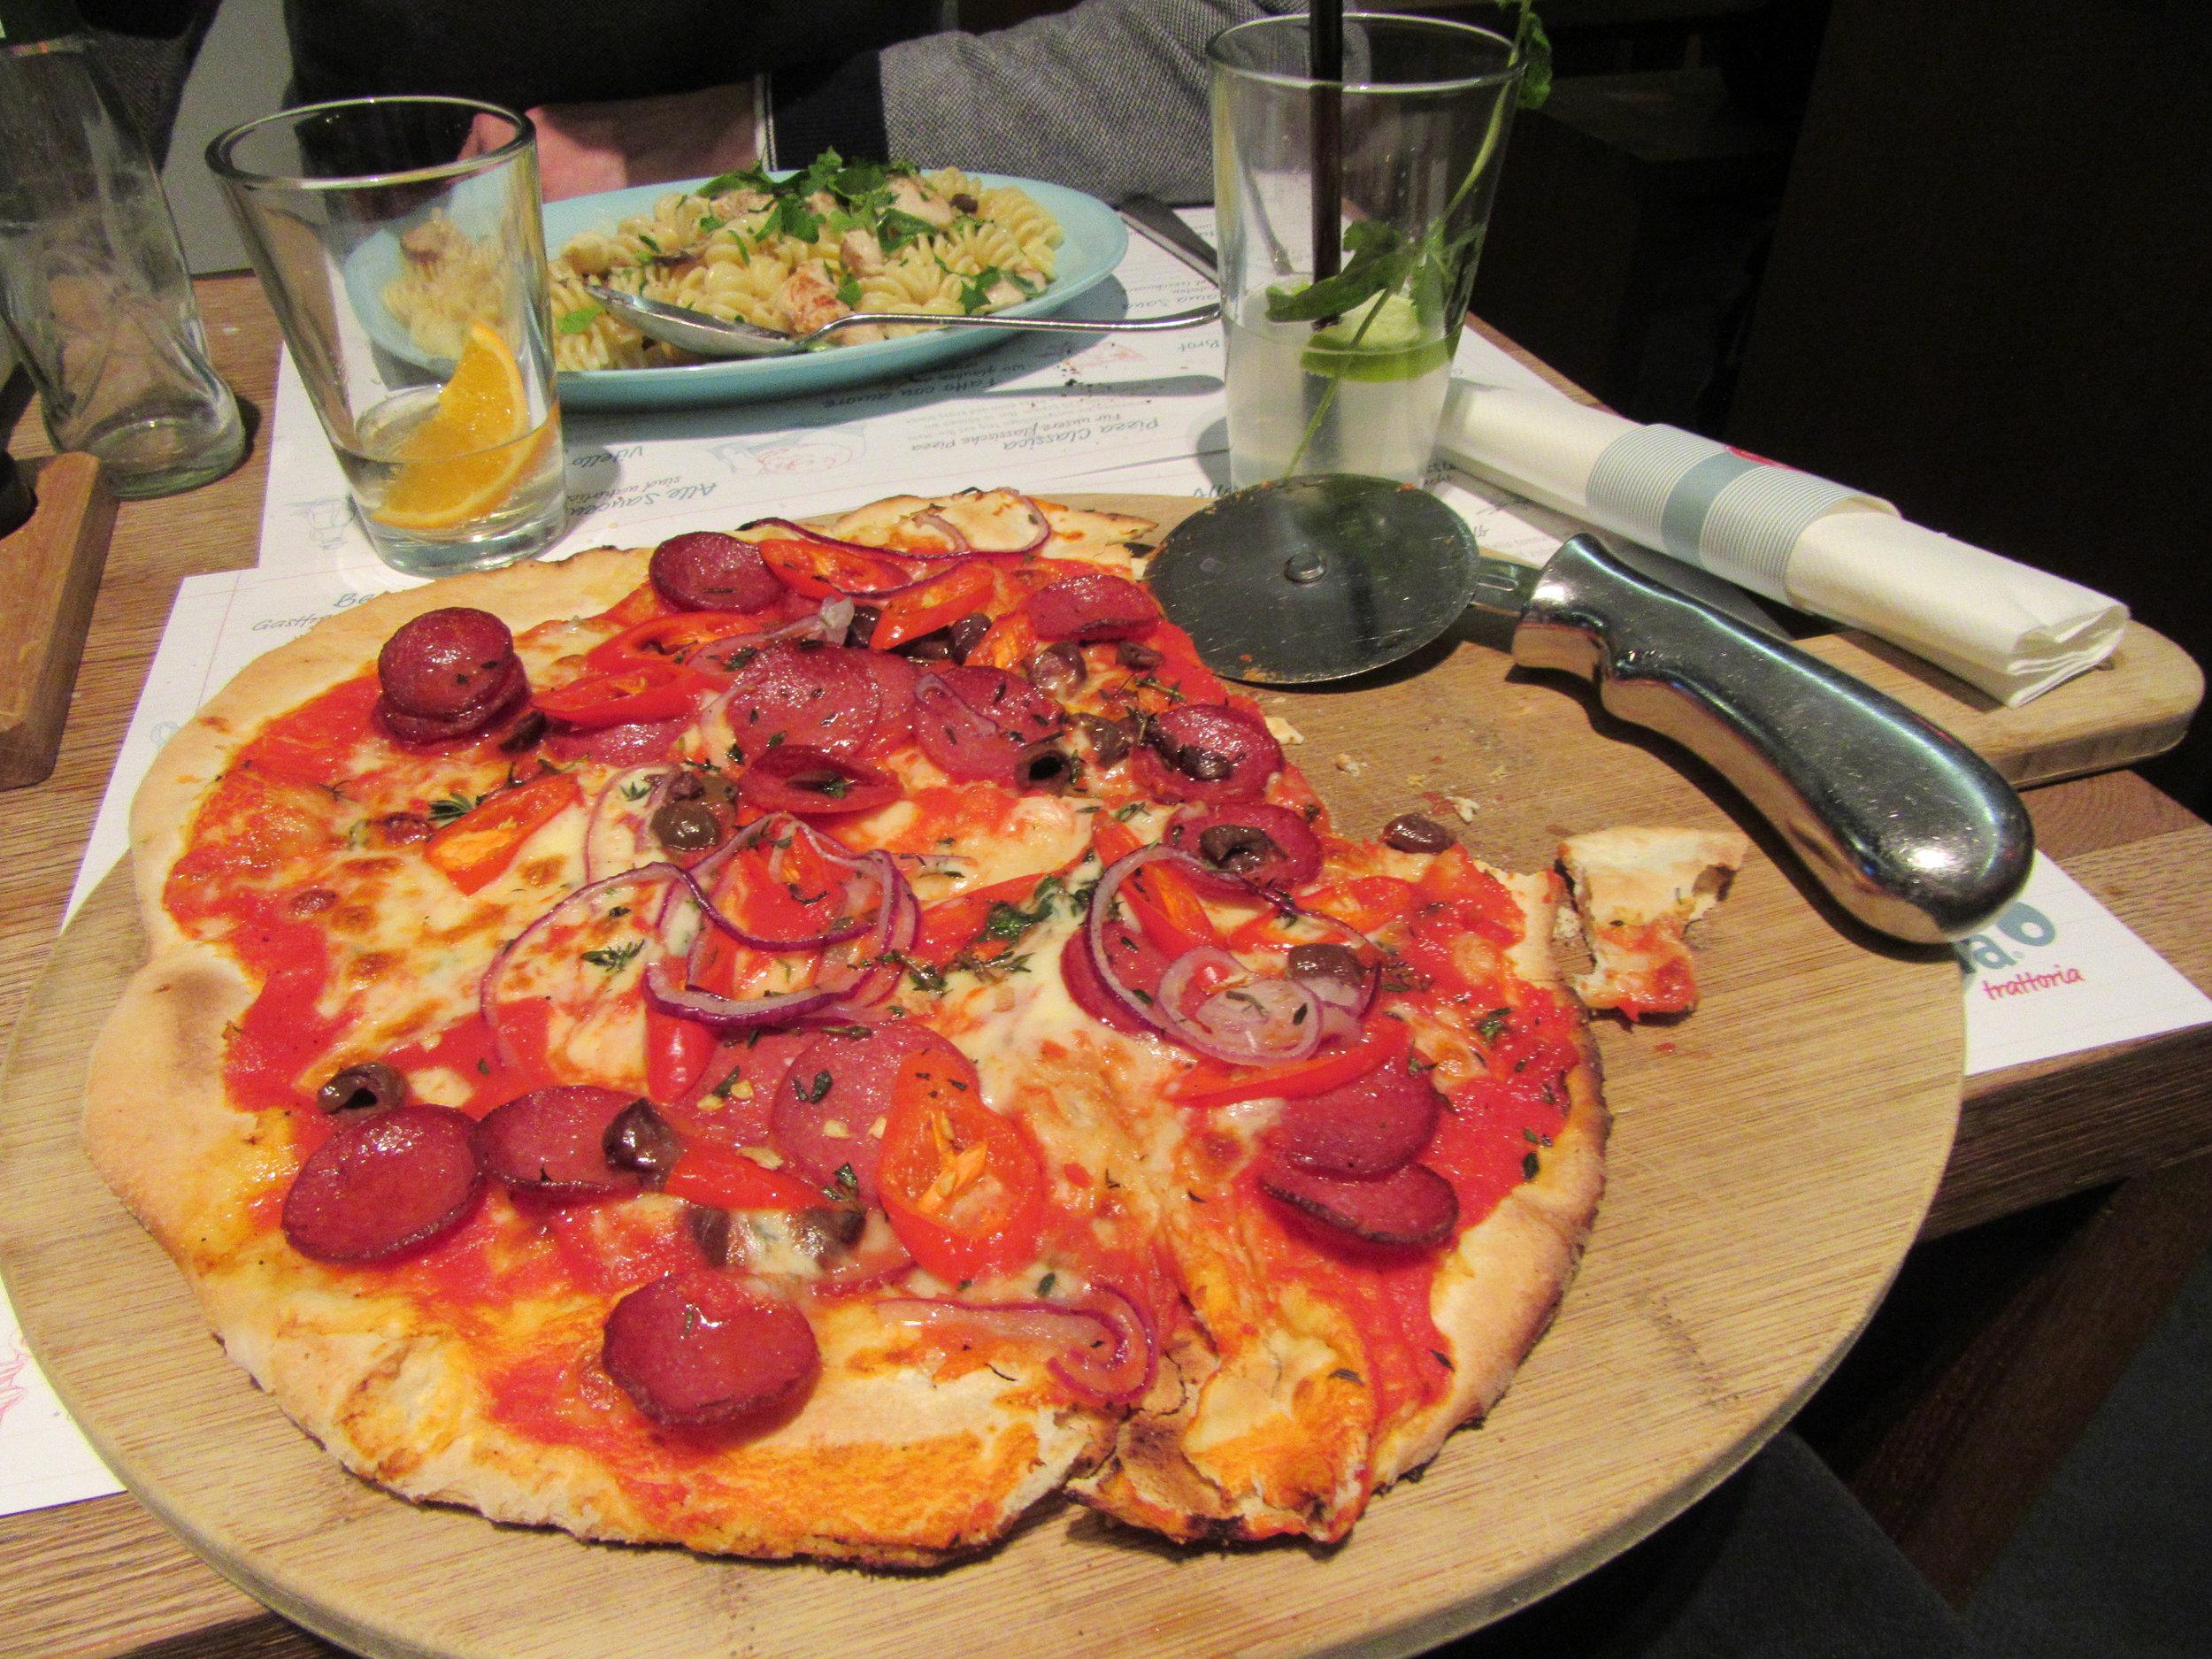 A diavola pizza from    mama trattoria City   .